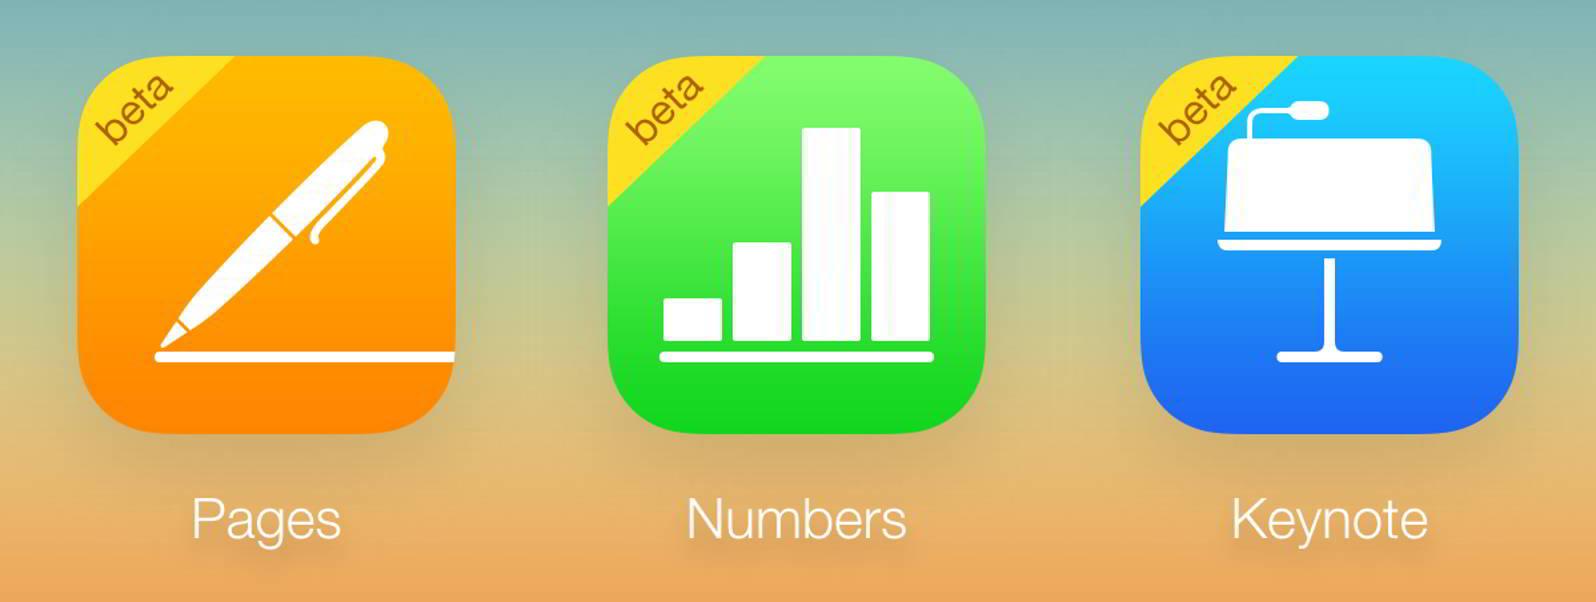 Pages, Numbers, Keynote gratuit